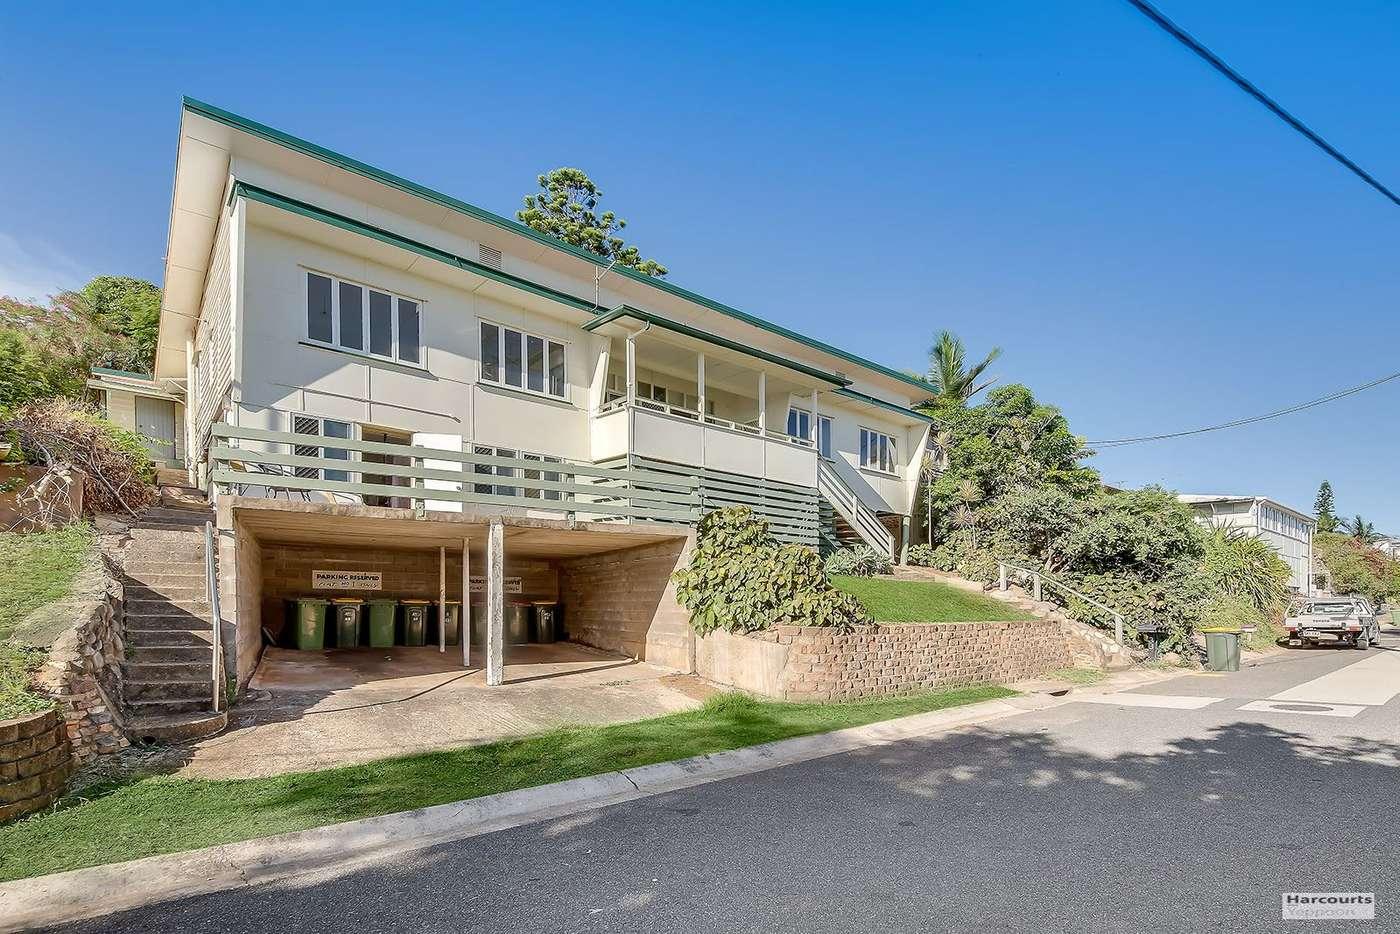 Main view of Homely blockOfUnits listing, 33 Raymond Terrace, Yeppoon QLD 4703